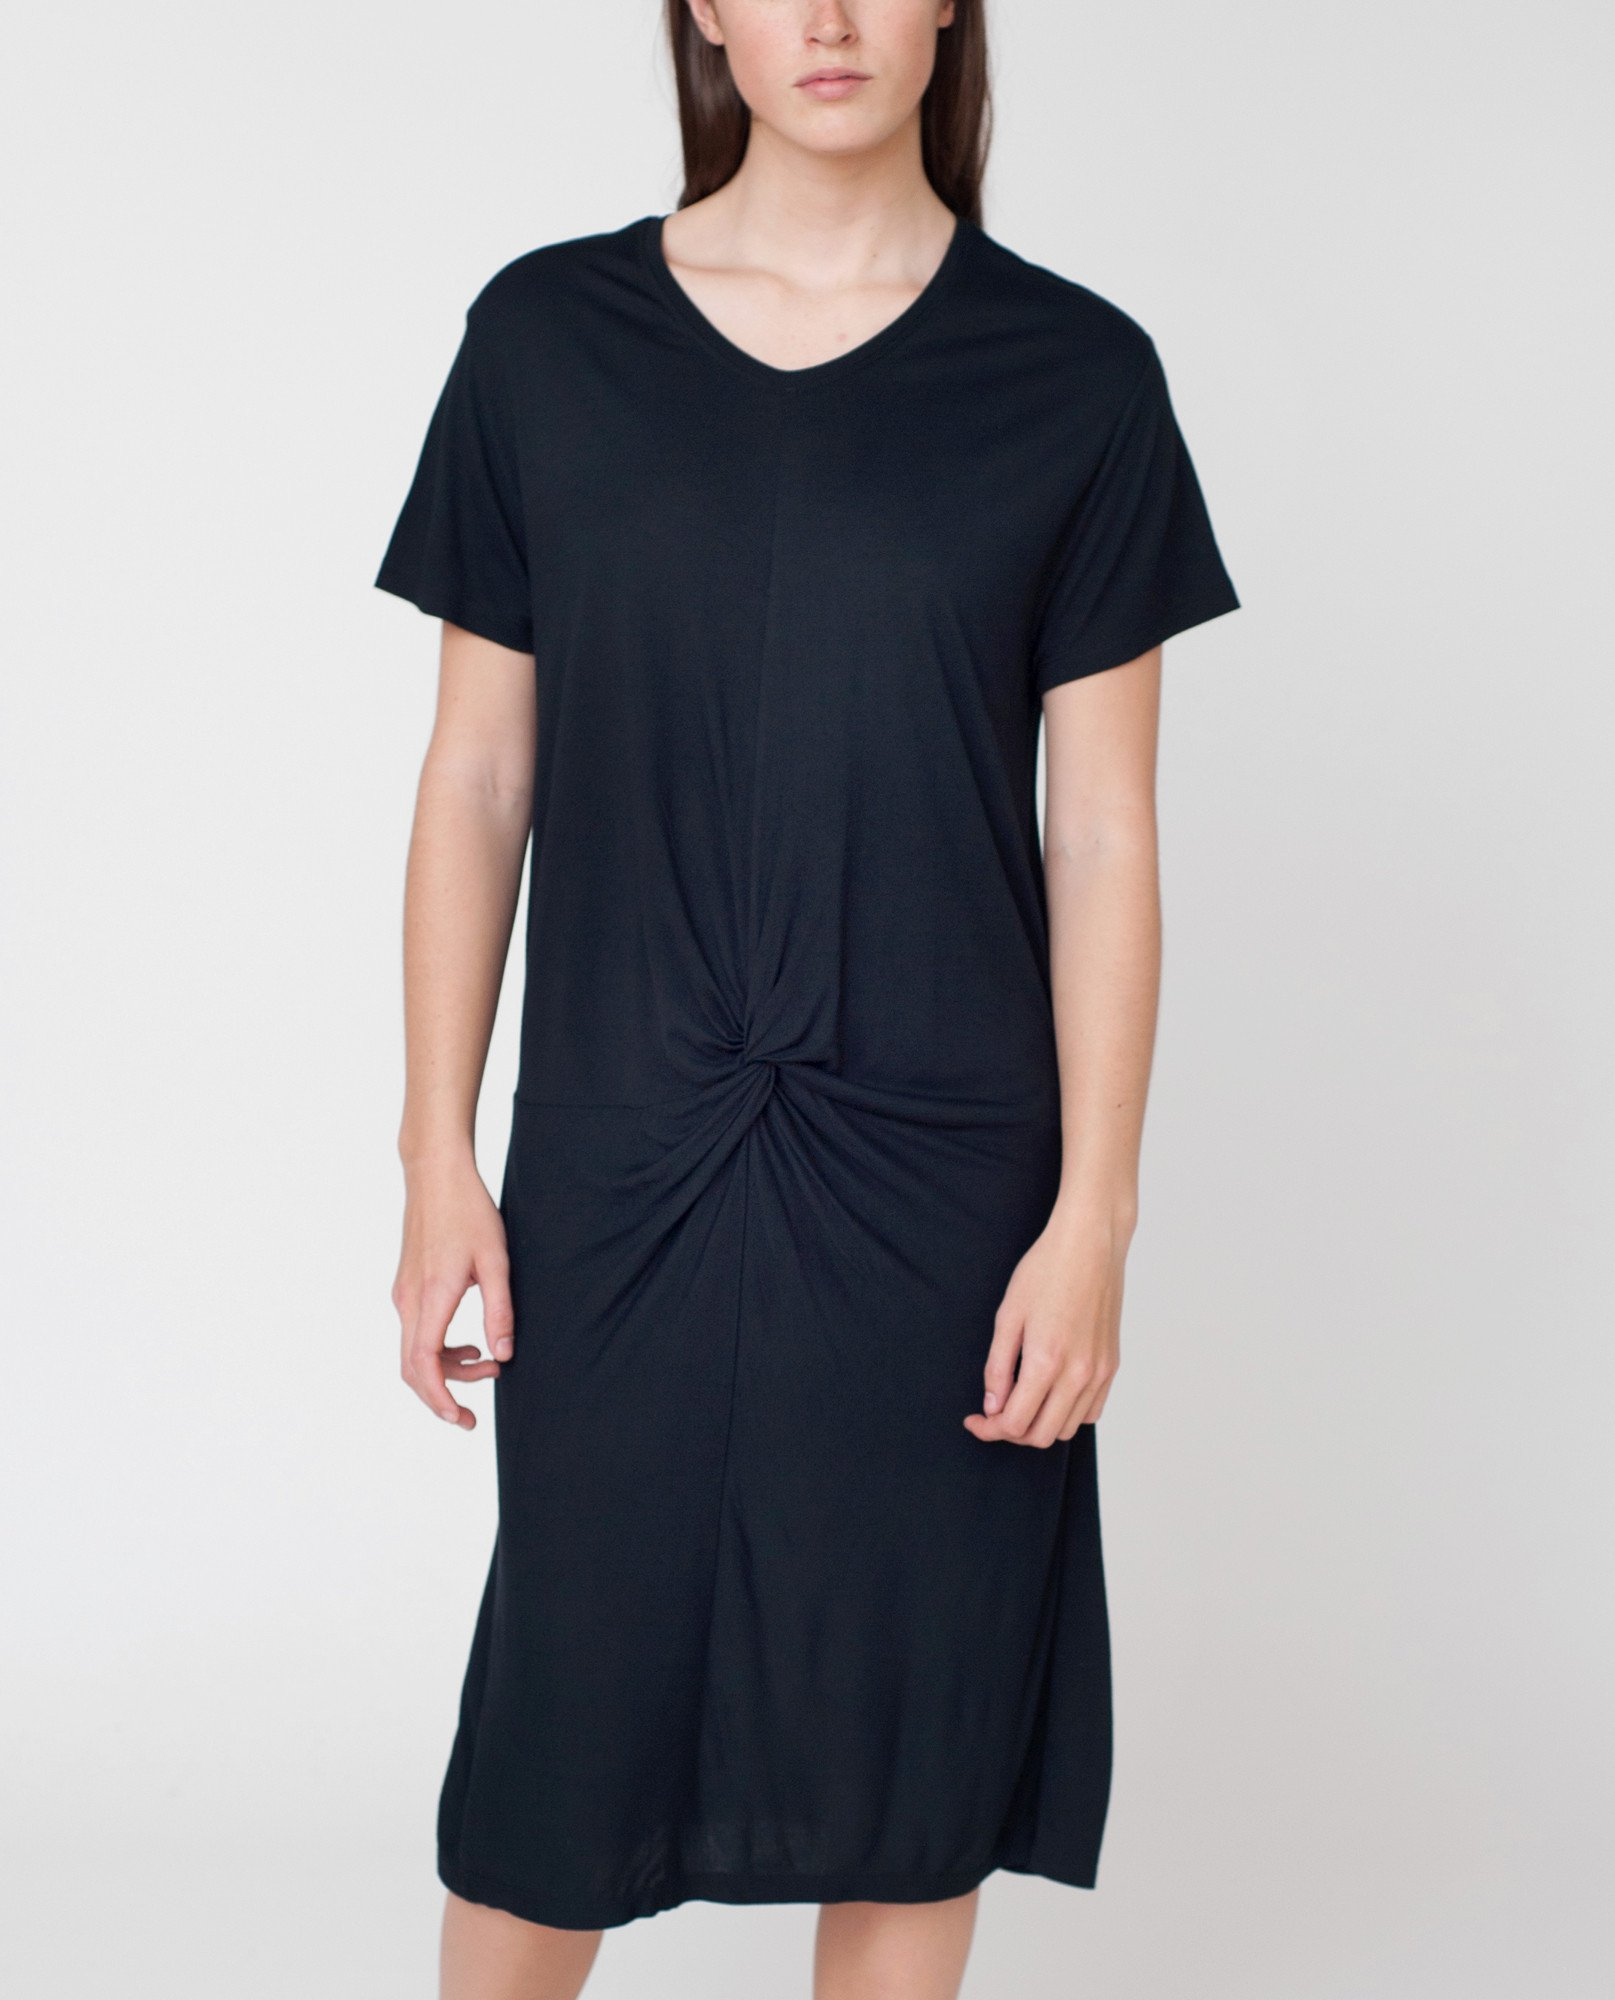 MEGAN Bamboo Dress from Beaumont Organic